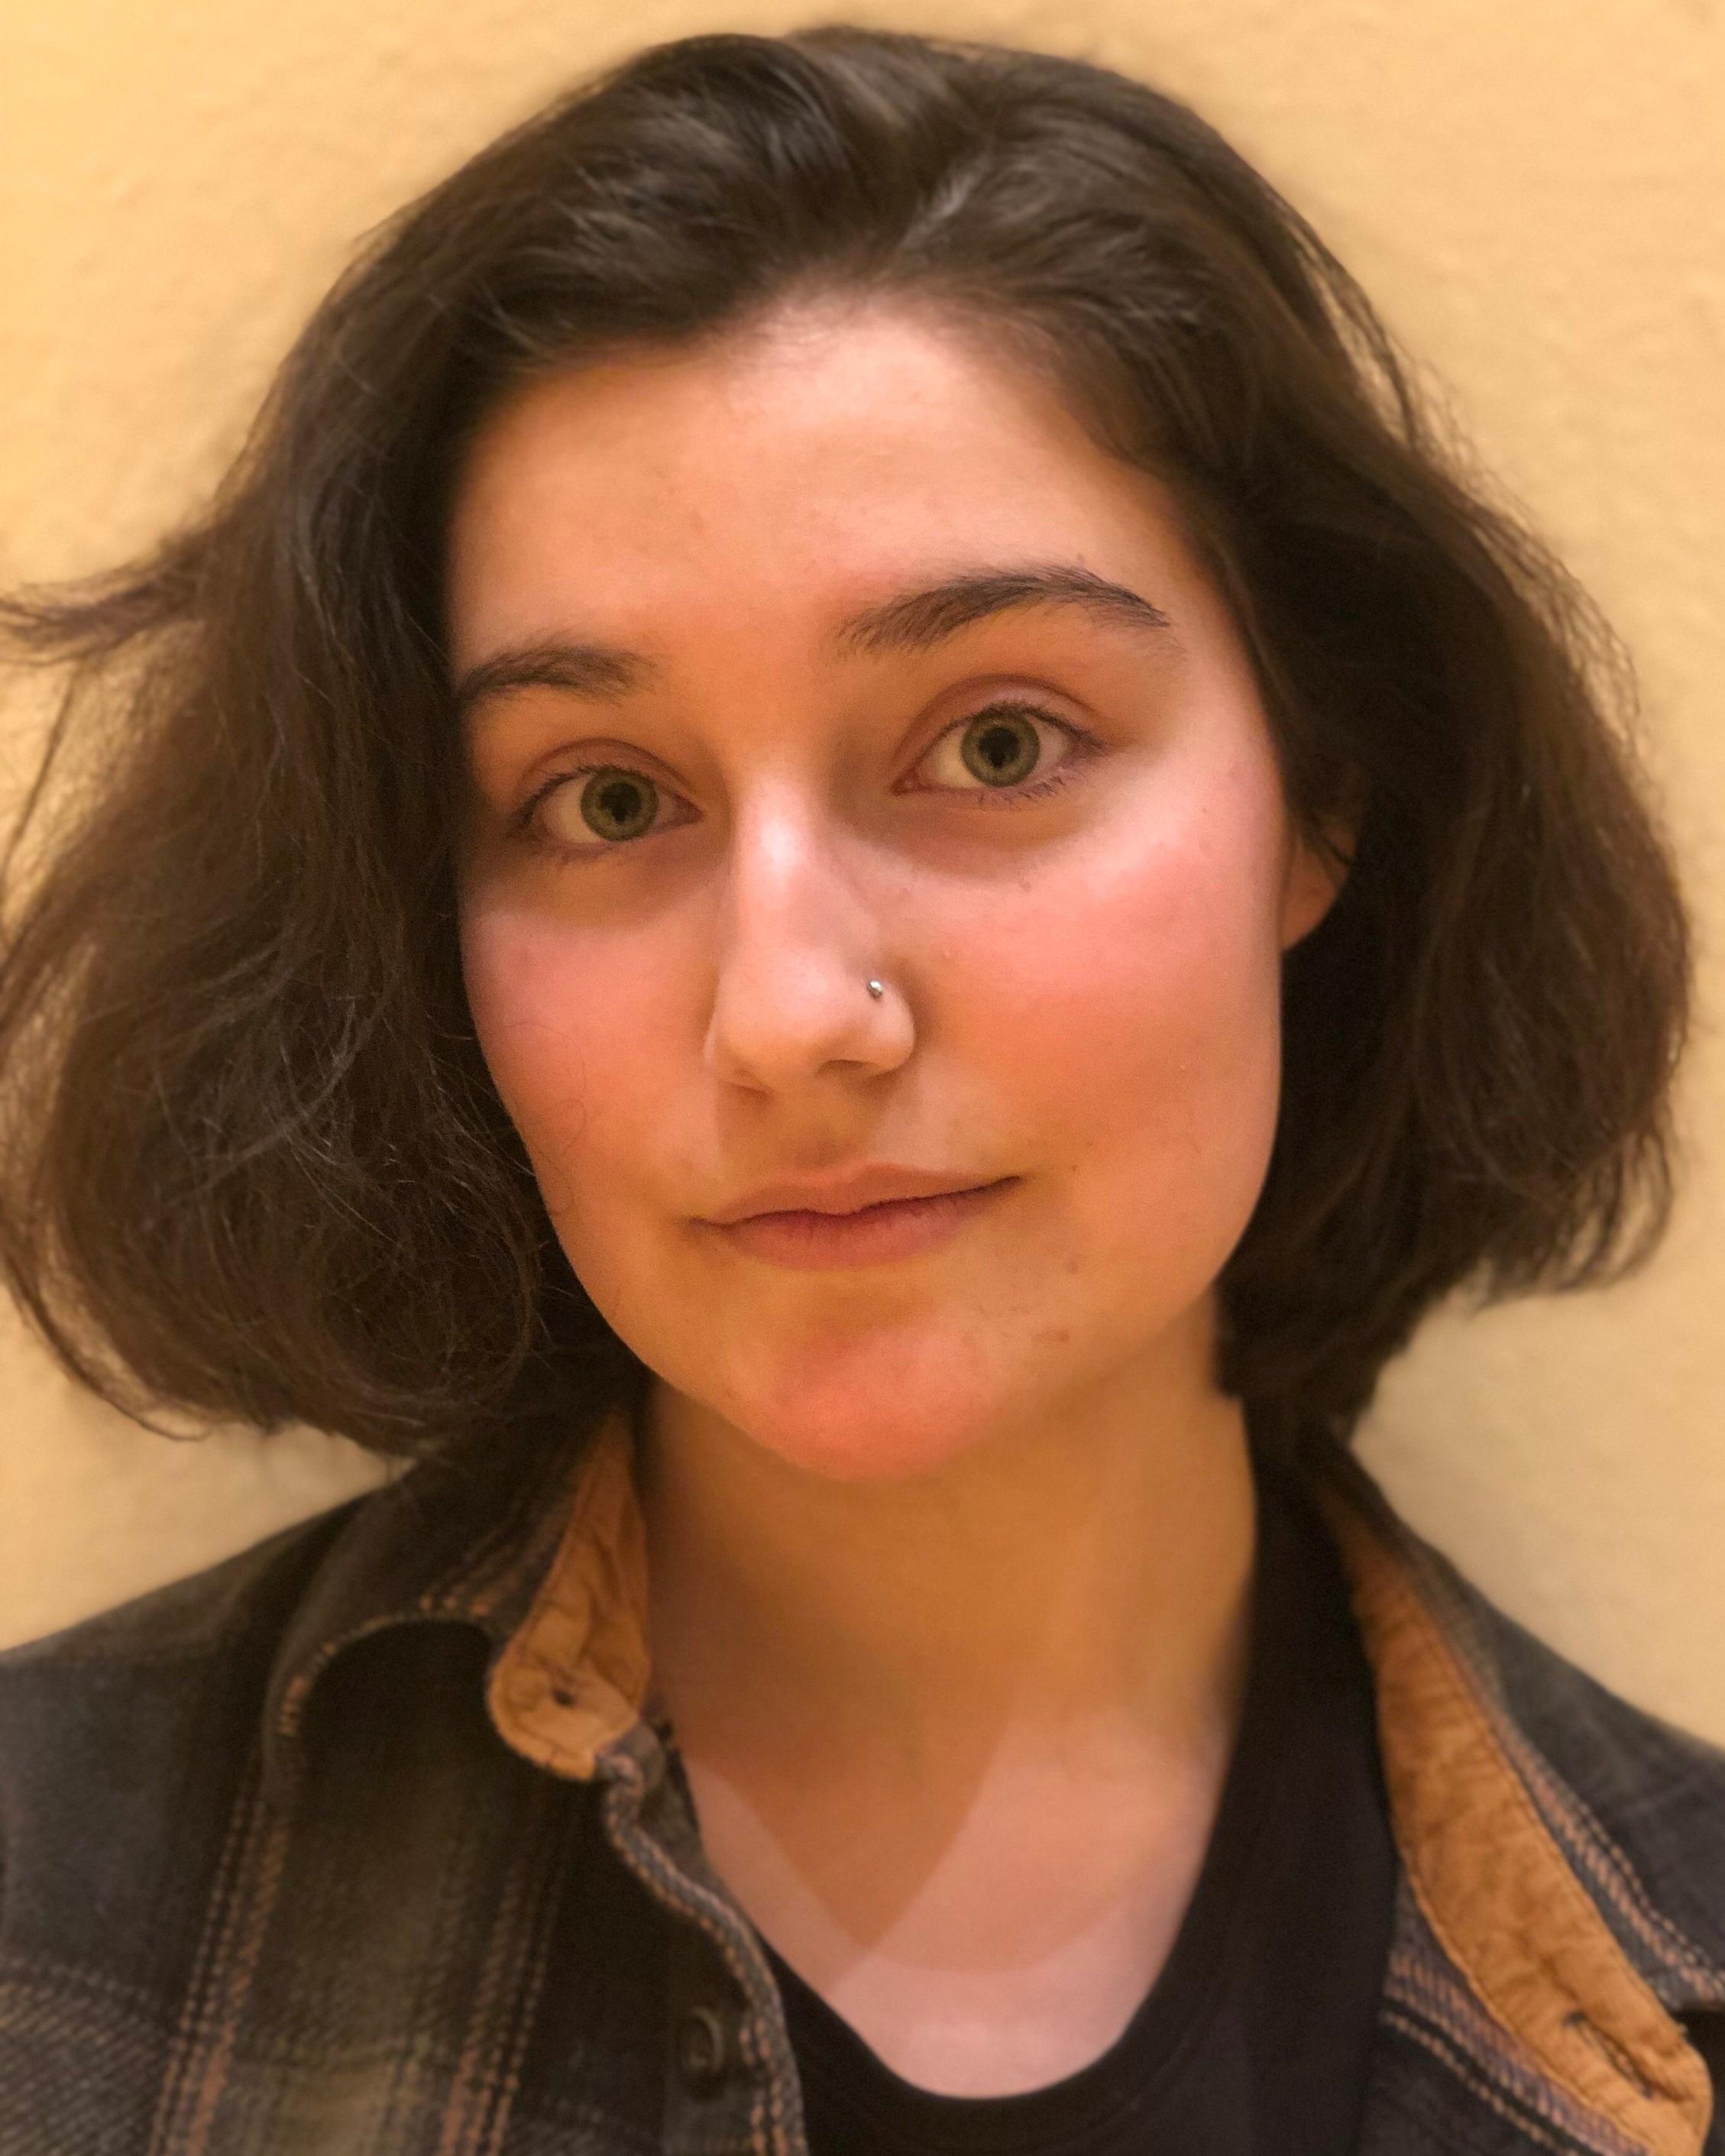 Chloe Pleznac as meg march